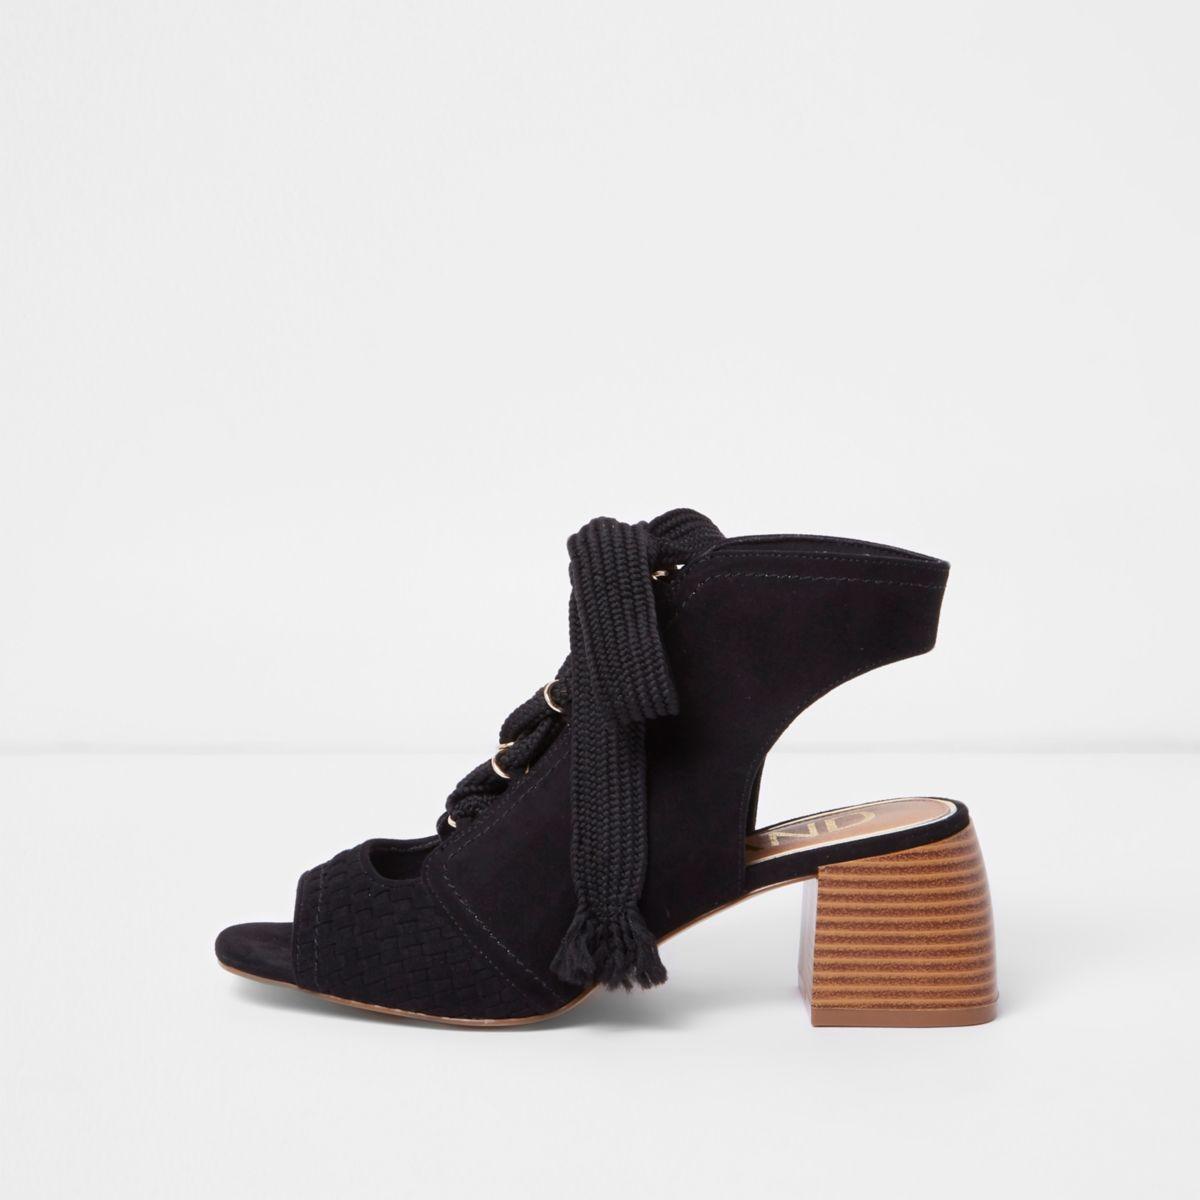 Black peep toe lace-up block heel shoe boots